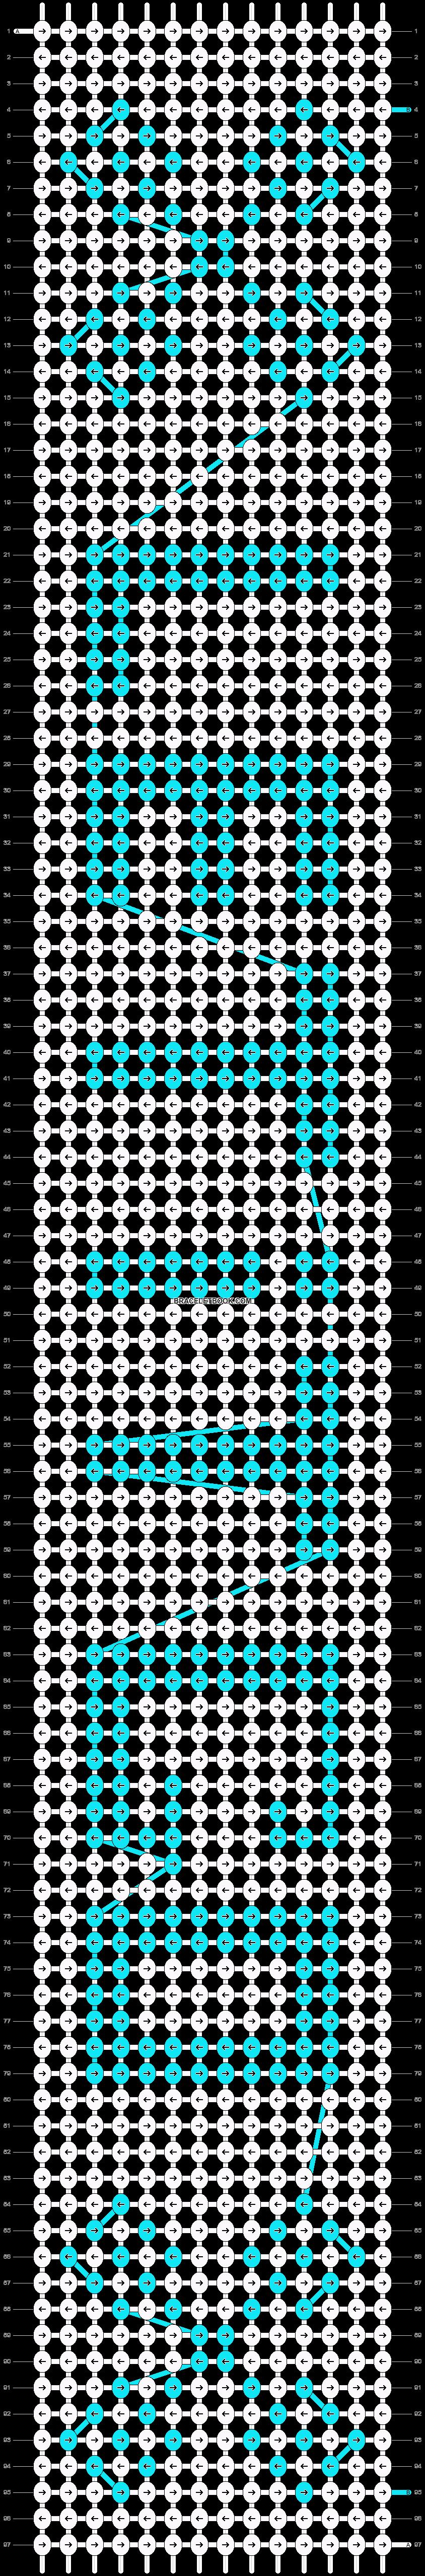 Alpha pattern #13091 pattern